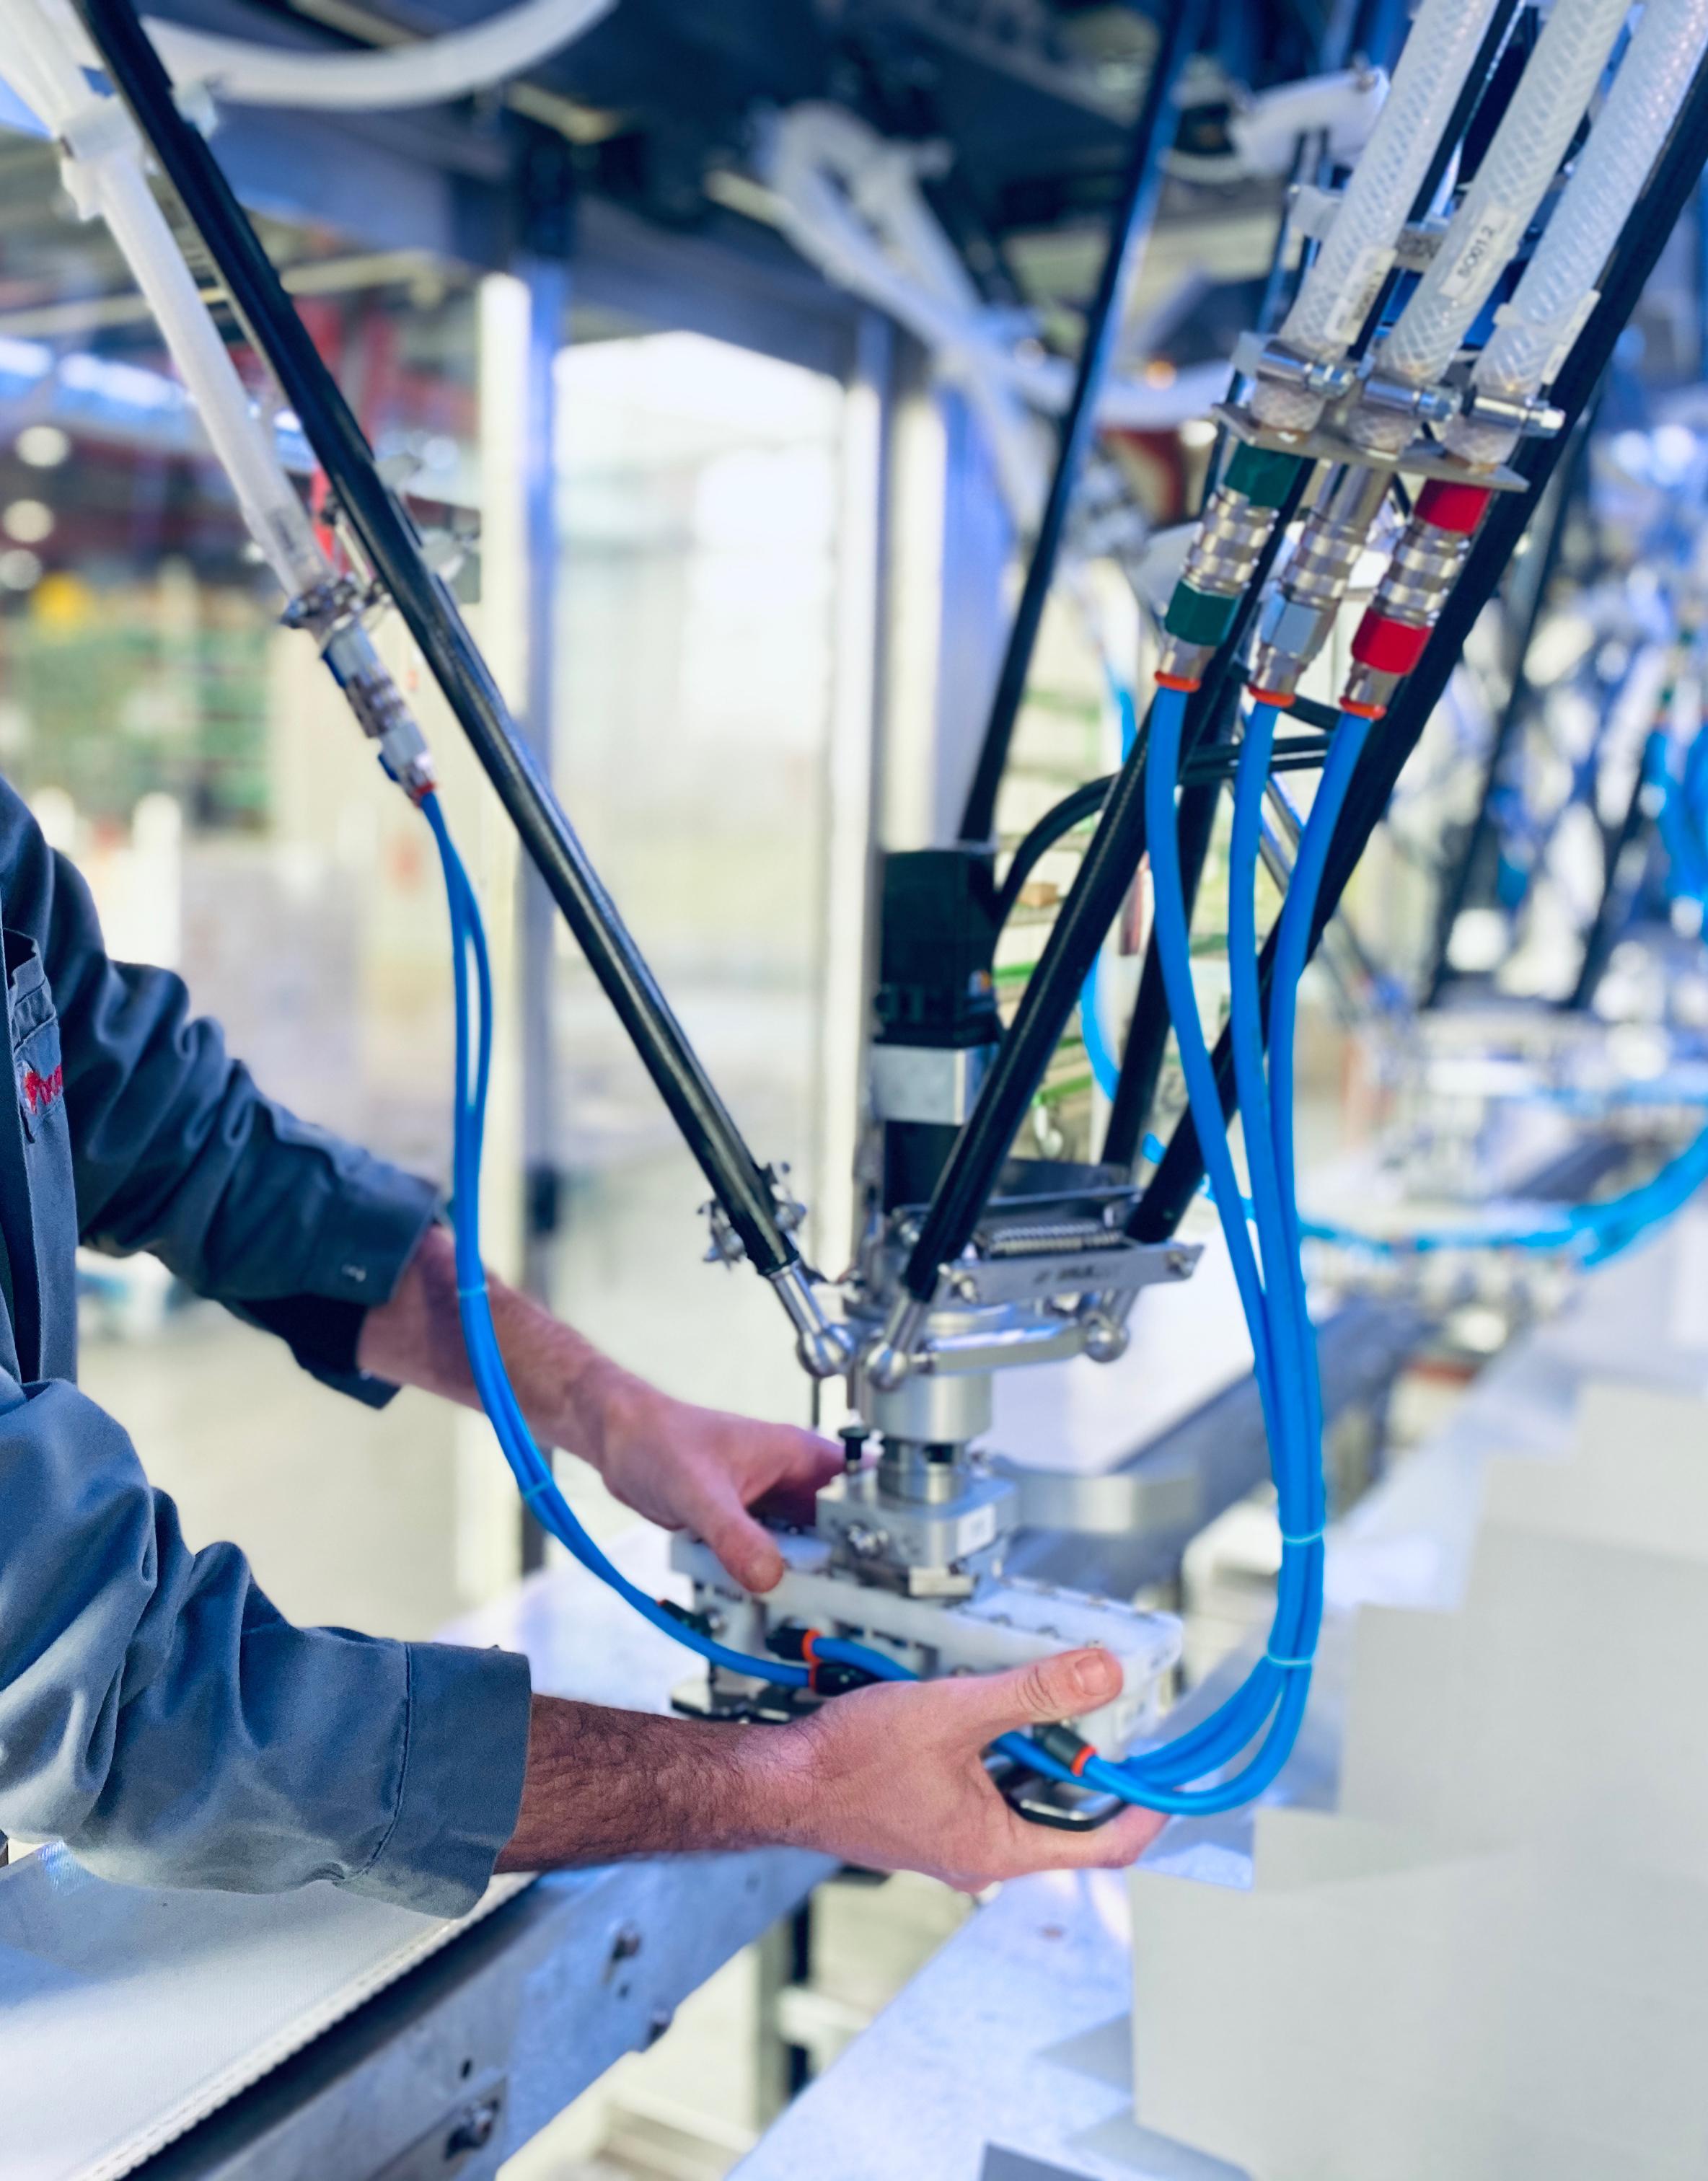 ixapack global integrated manufacture